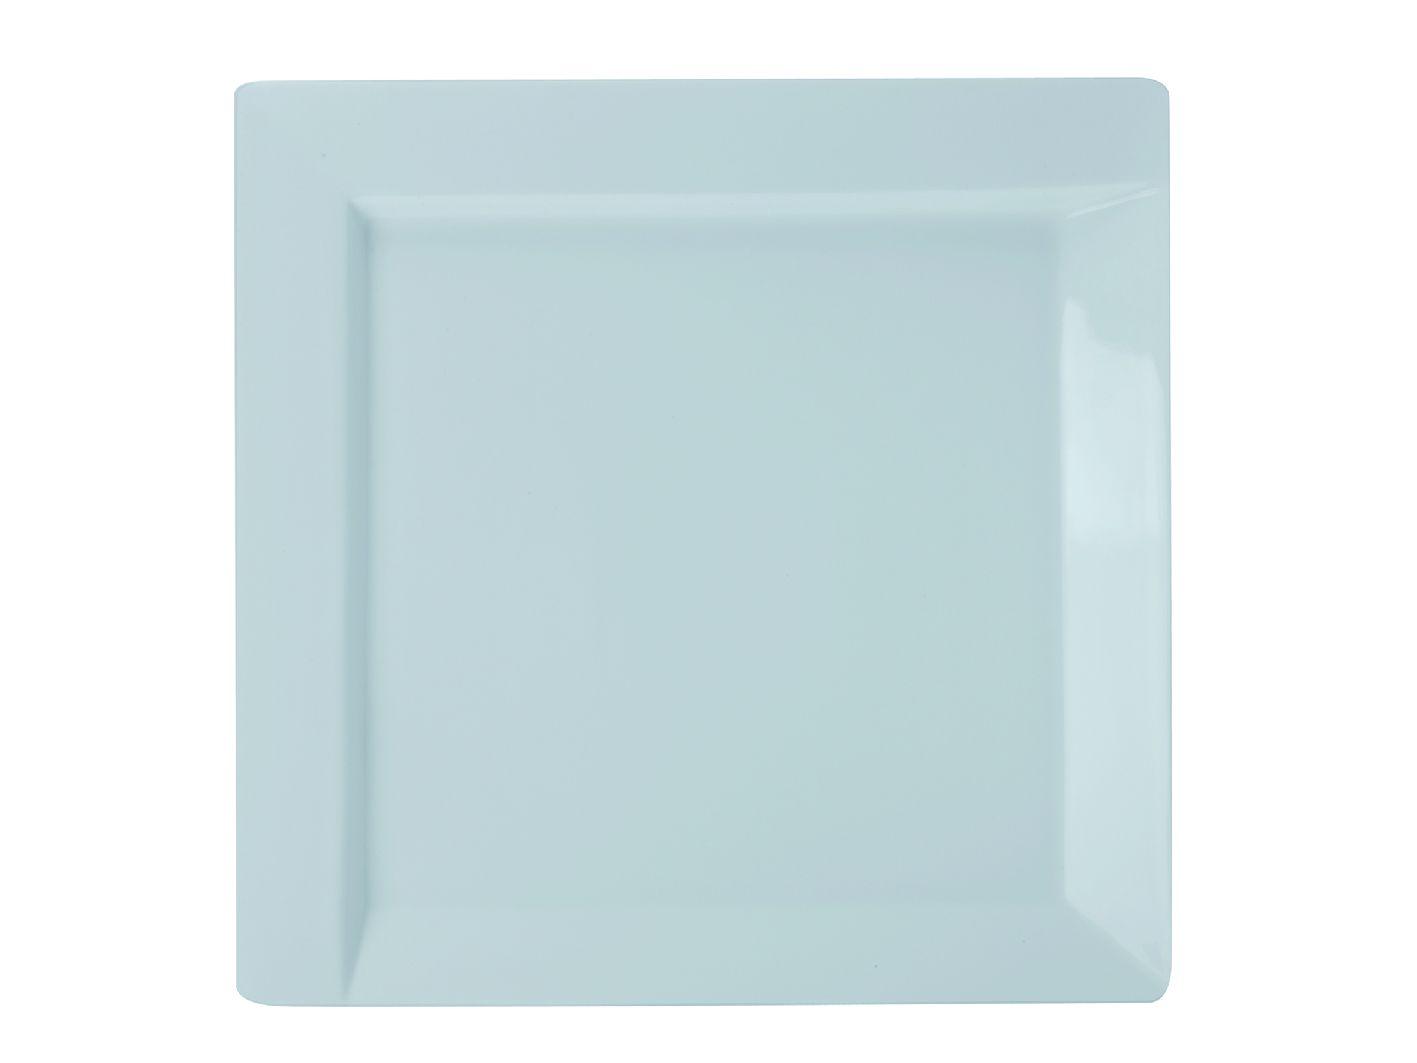 Porcelánový Jídelní talíř ZiiZ 22 cm - Maxwell&Williams